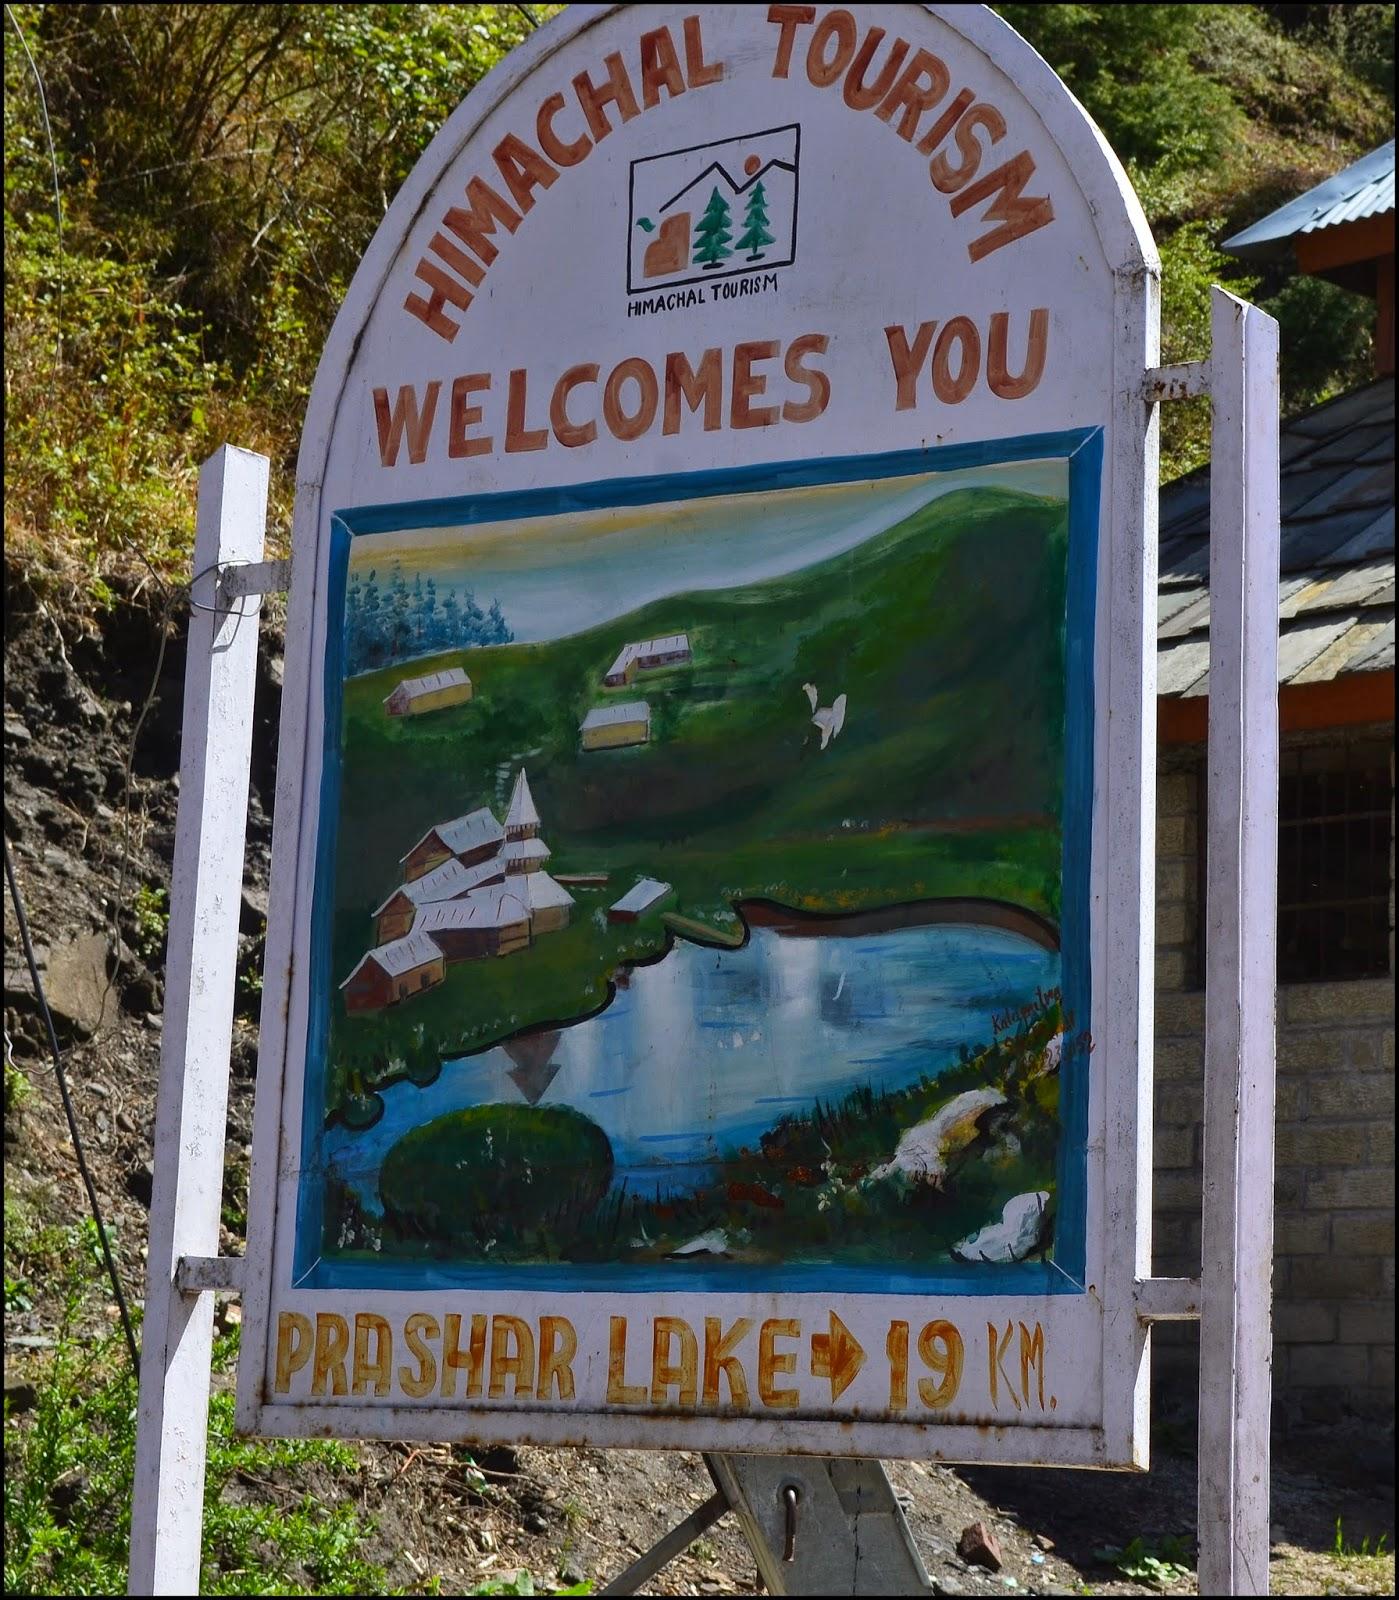 Prashar lake, Himachal Tourism